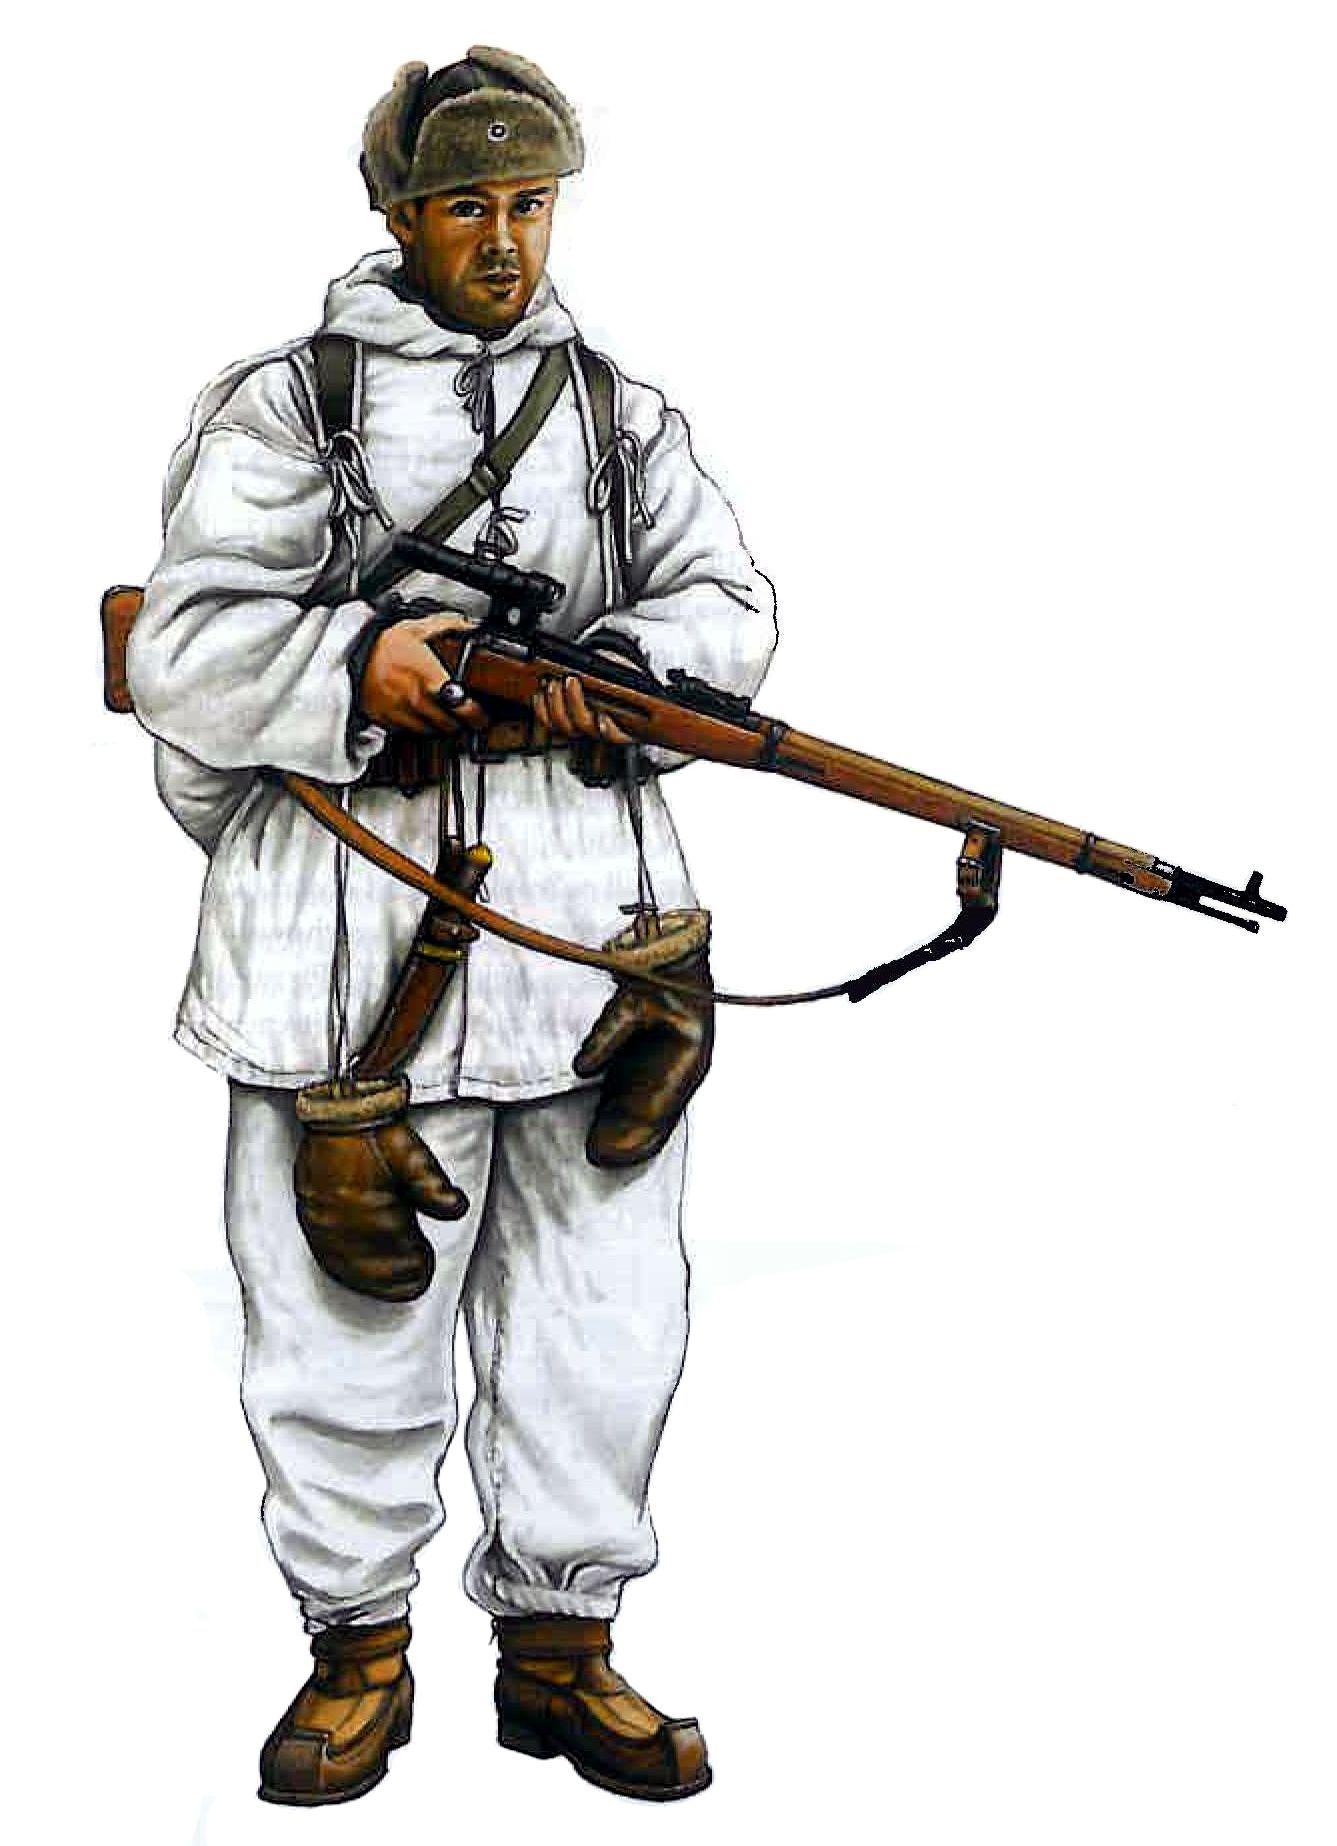 Finnish Sharpshooter During The Winter War Of 1940 World